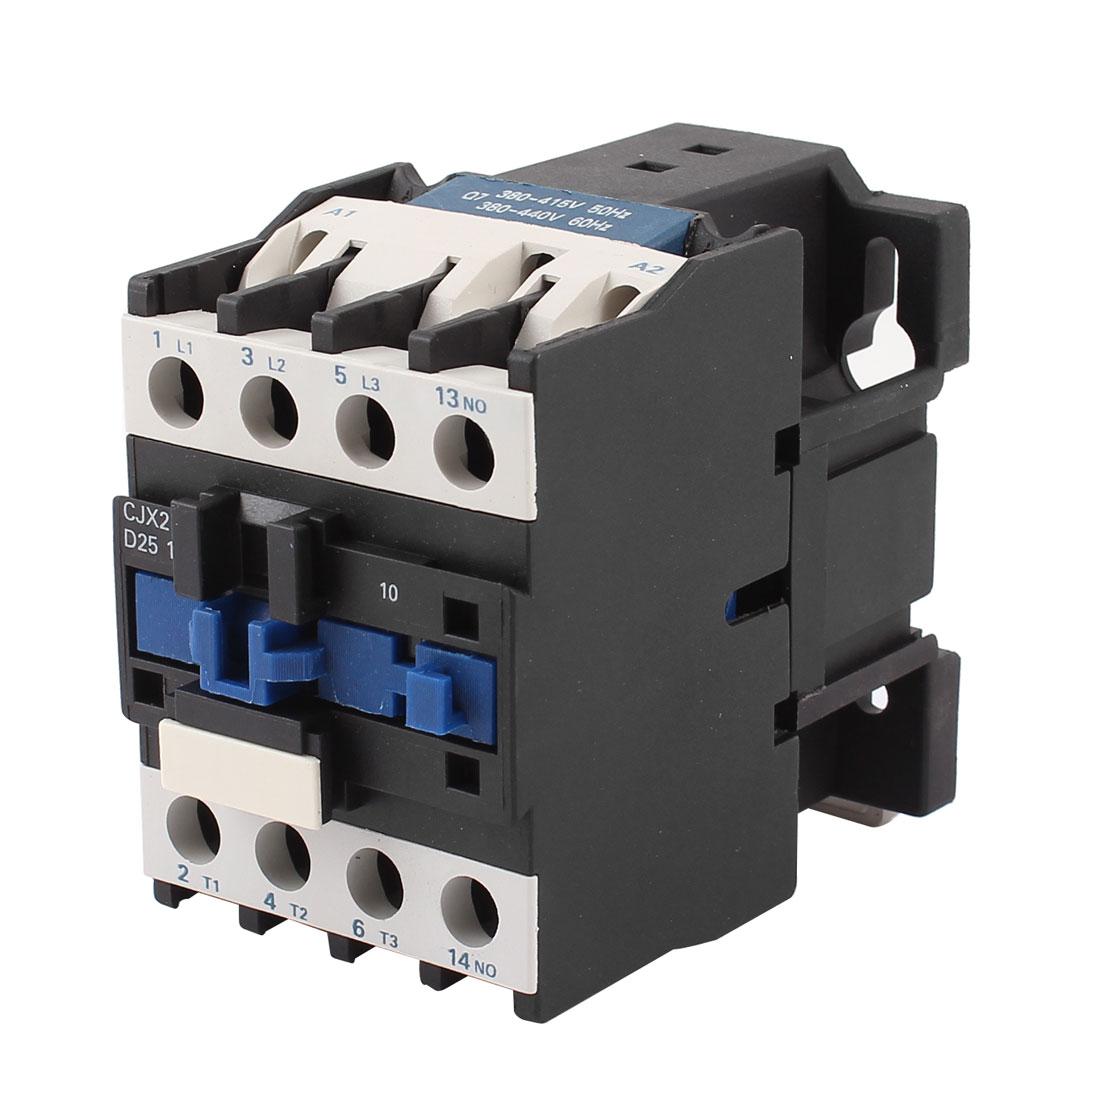 CJX2-2510 380V Coil 3 Poles 3P NO 35mm DIN Rail Mounting DIN Rail AC Contactor